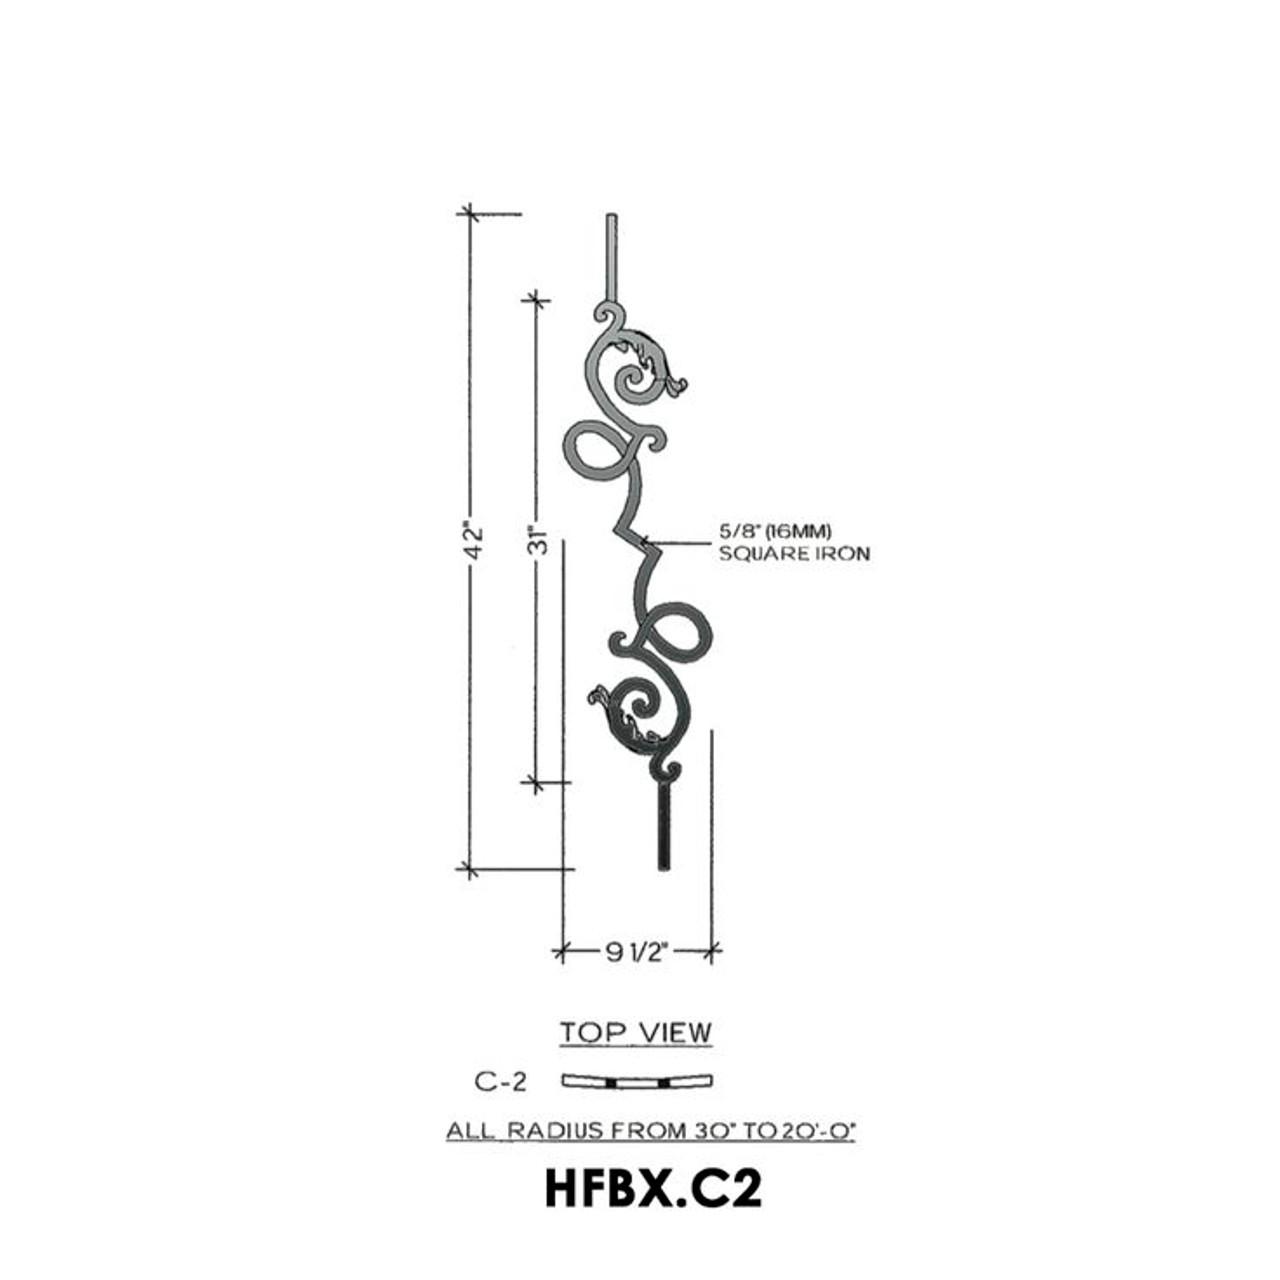 HFBX.C2 Bordeaux Curved Rake Iron Panel